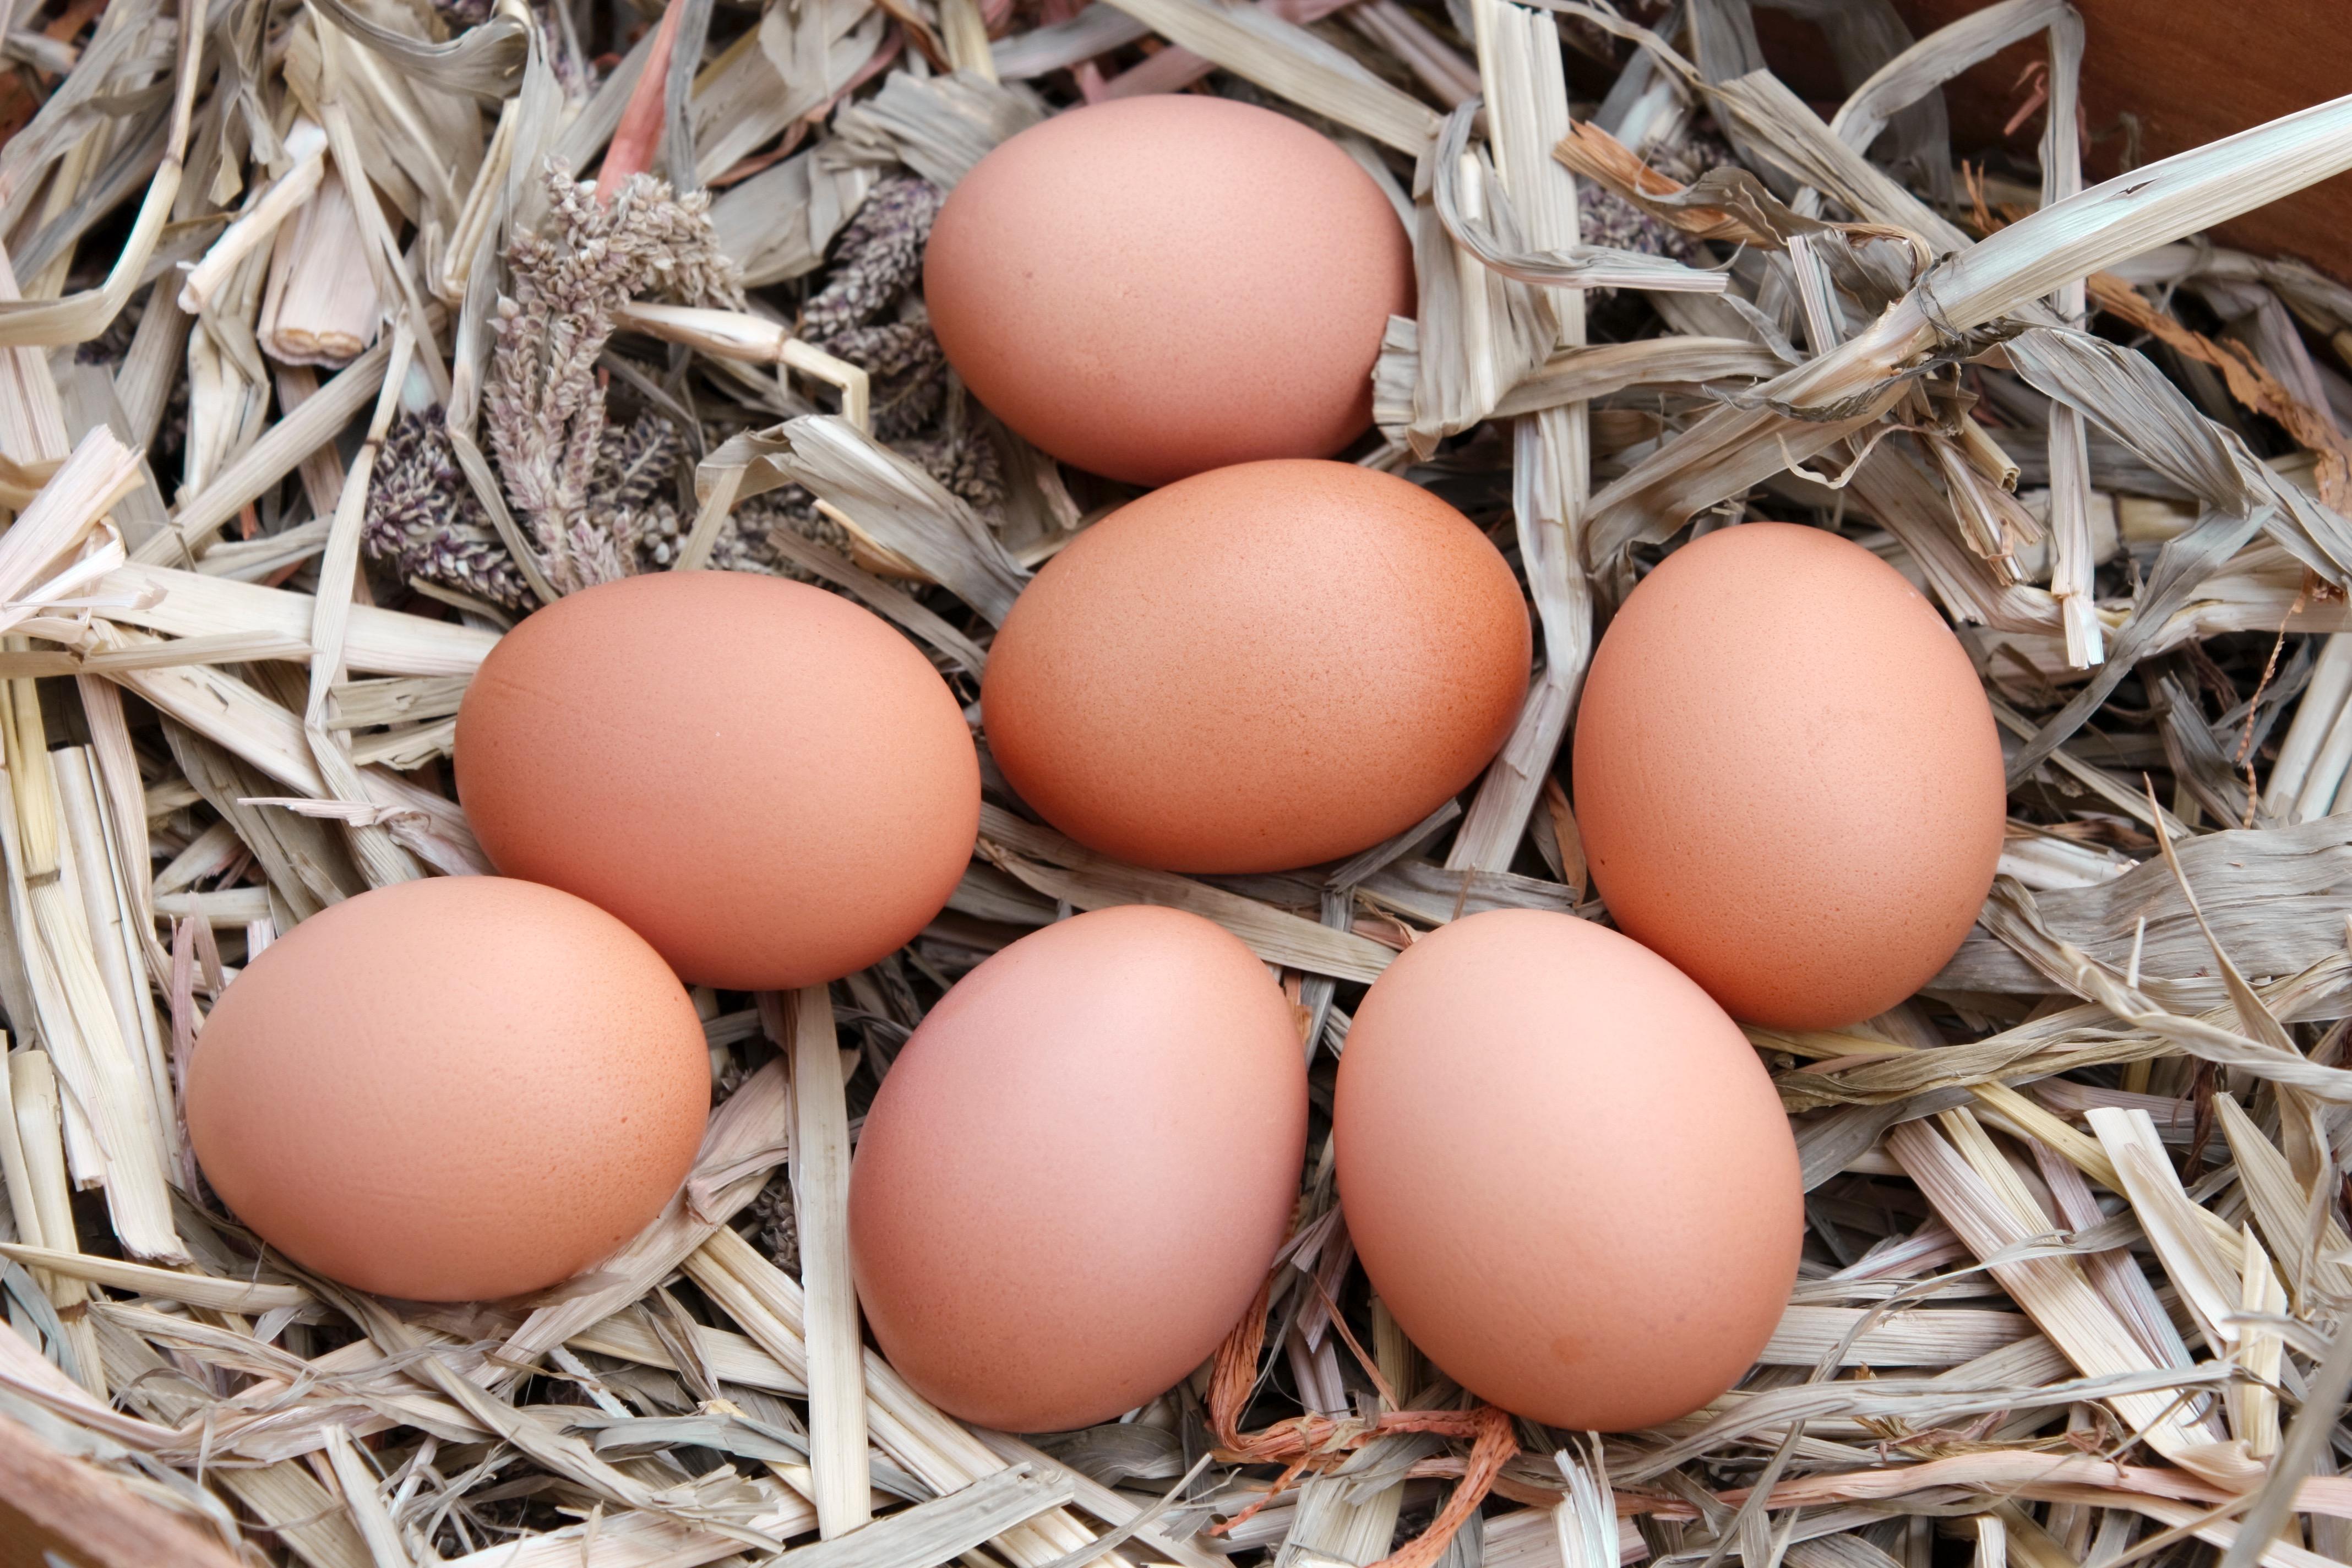 eggs-1149594